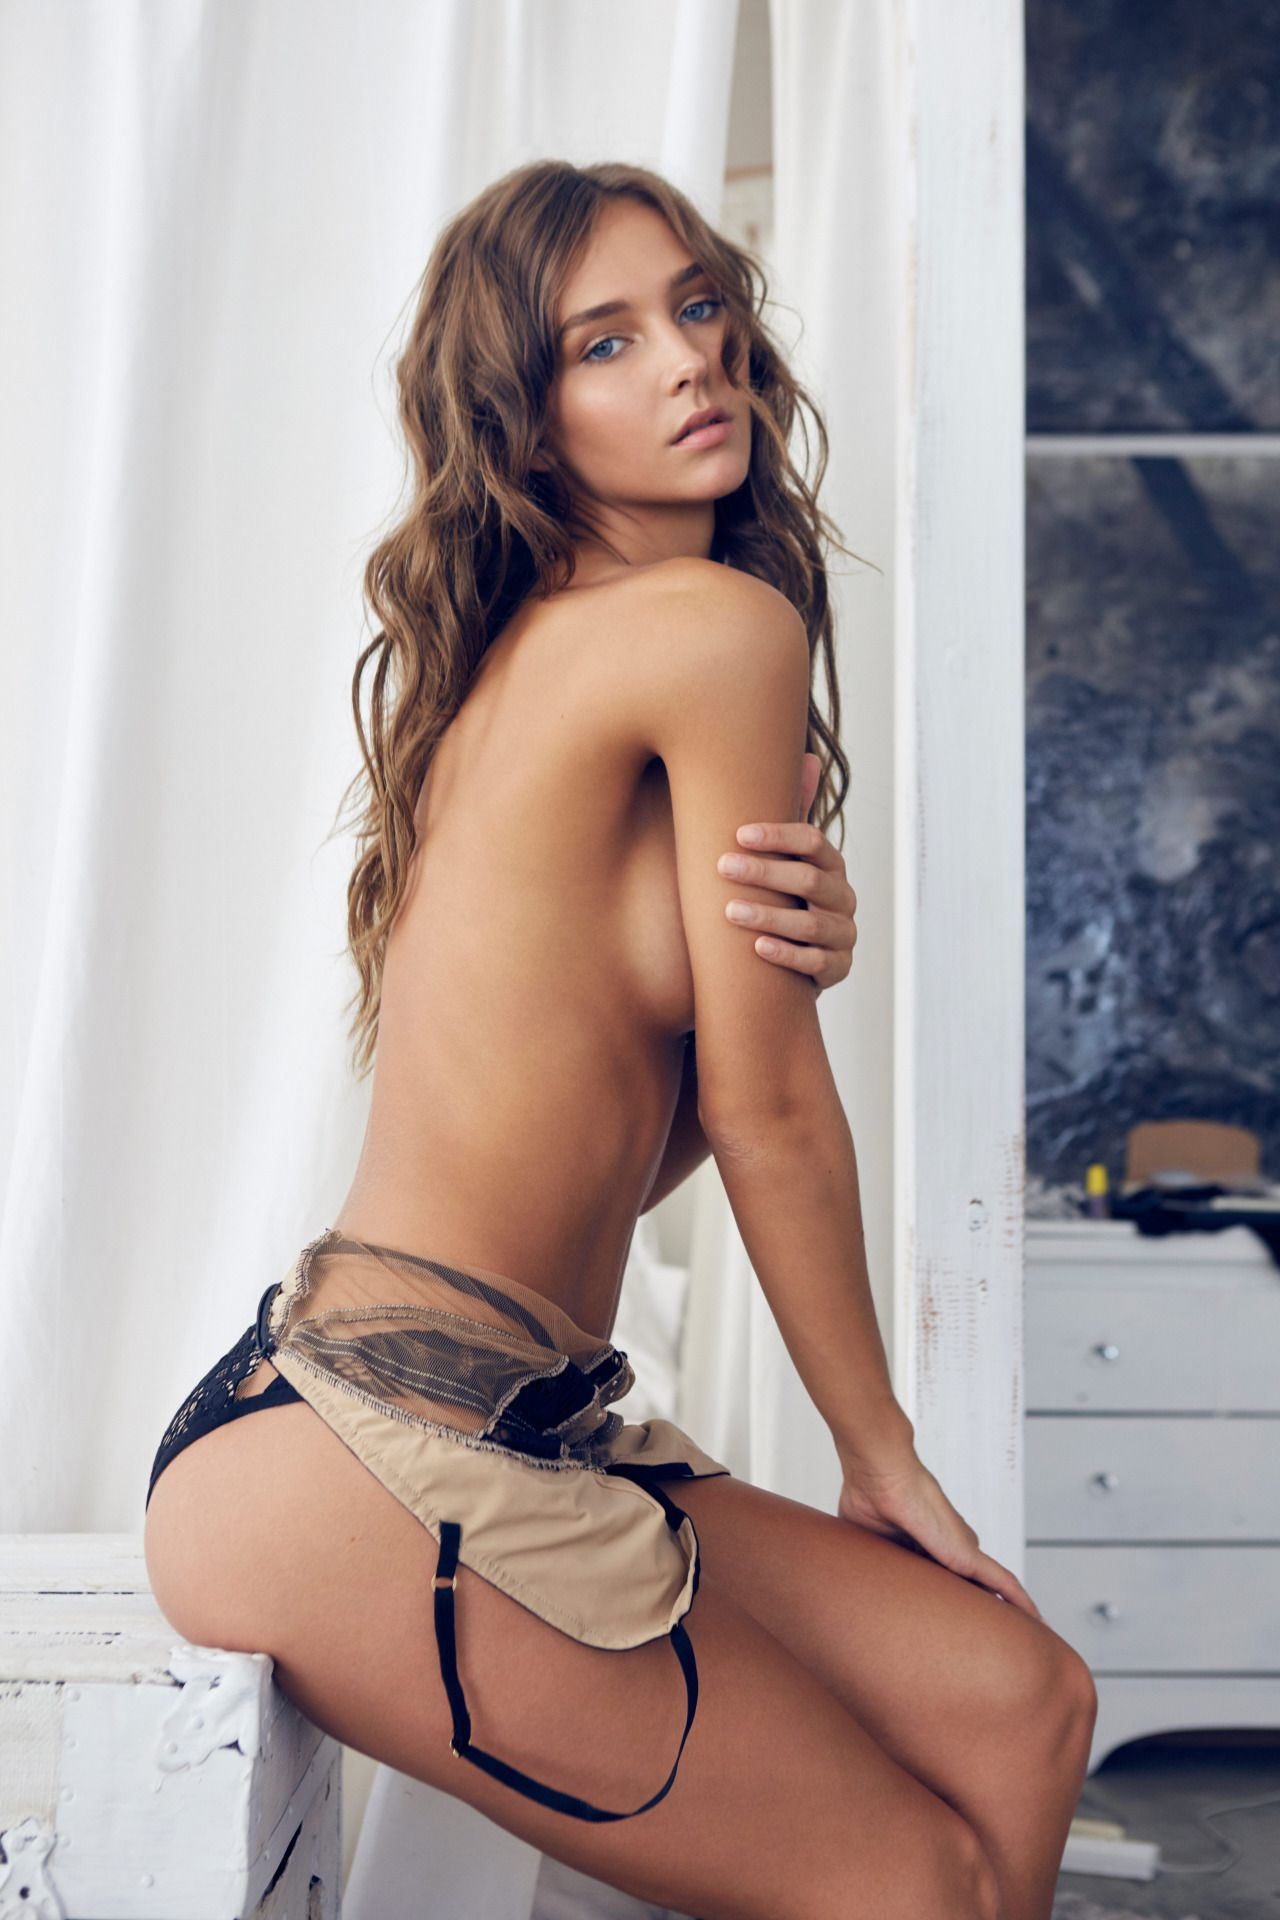 Amanda riley nude photos 2 recommendations